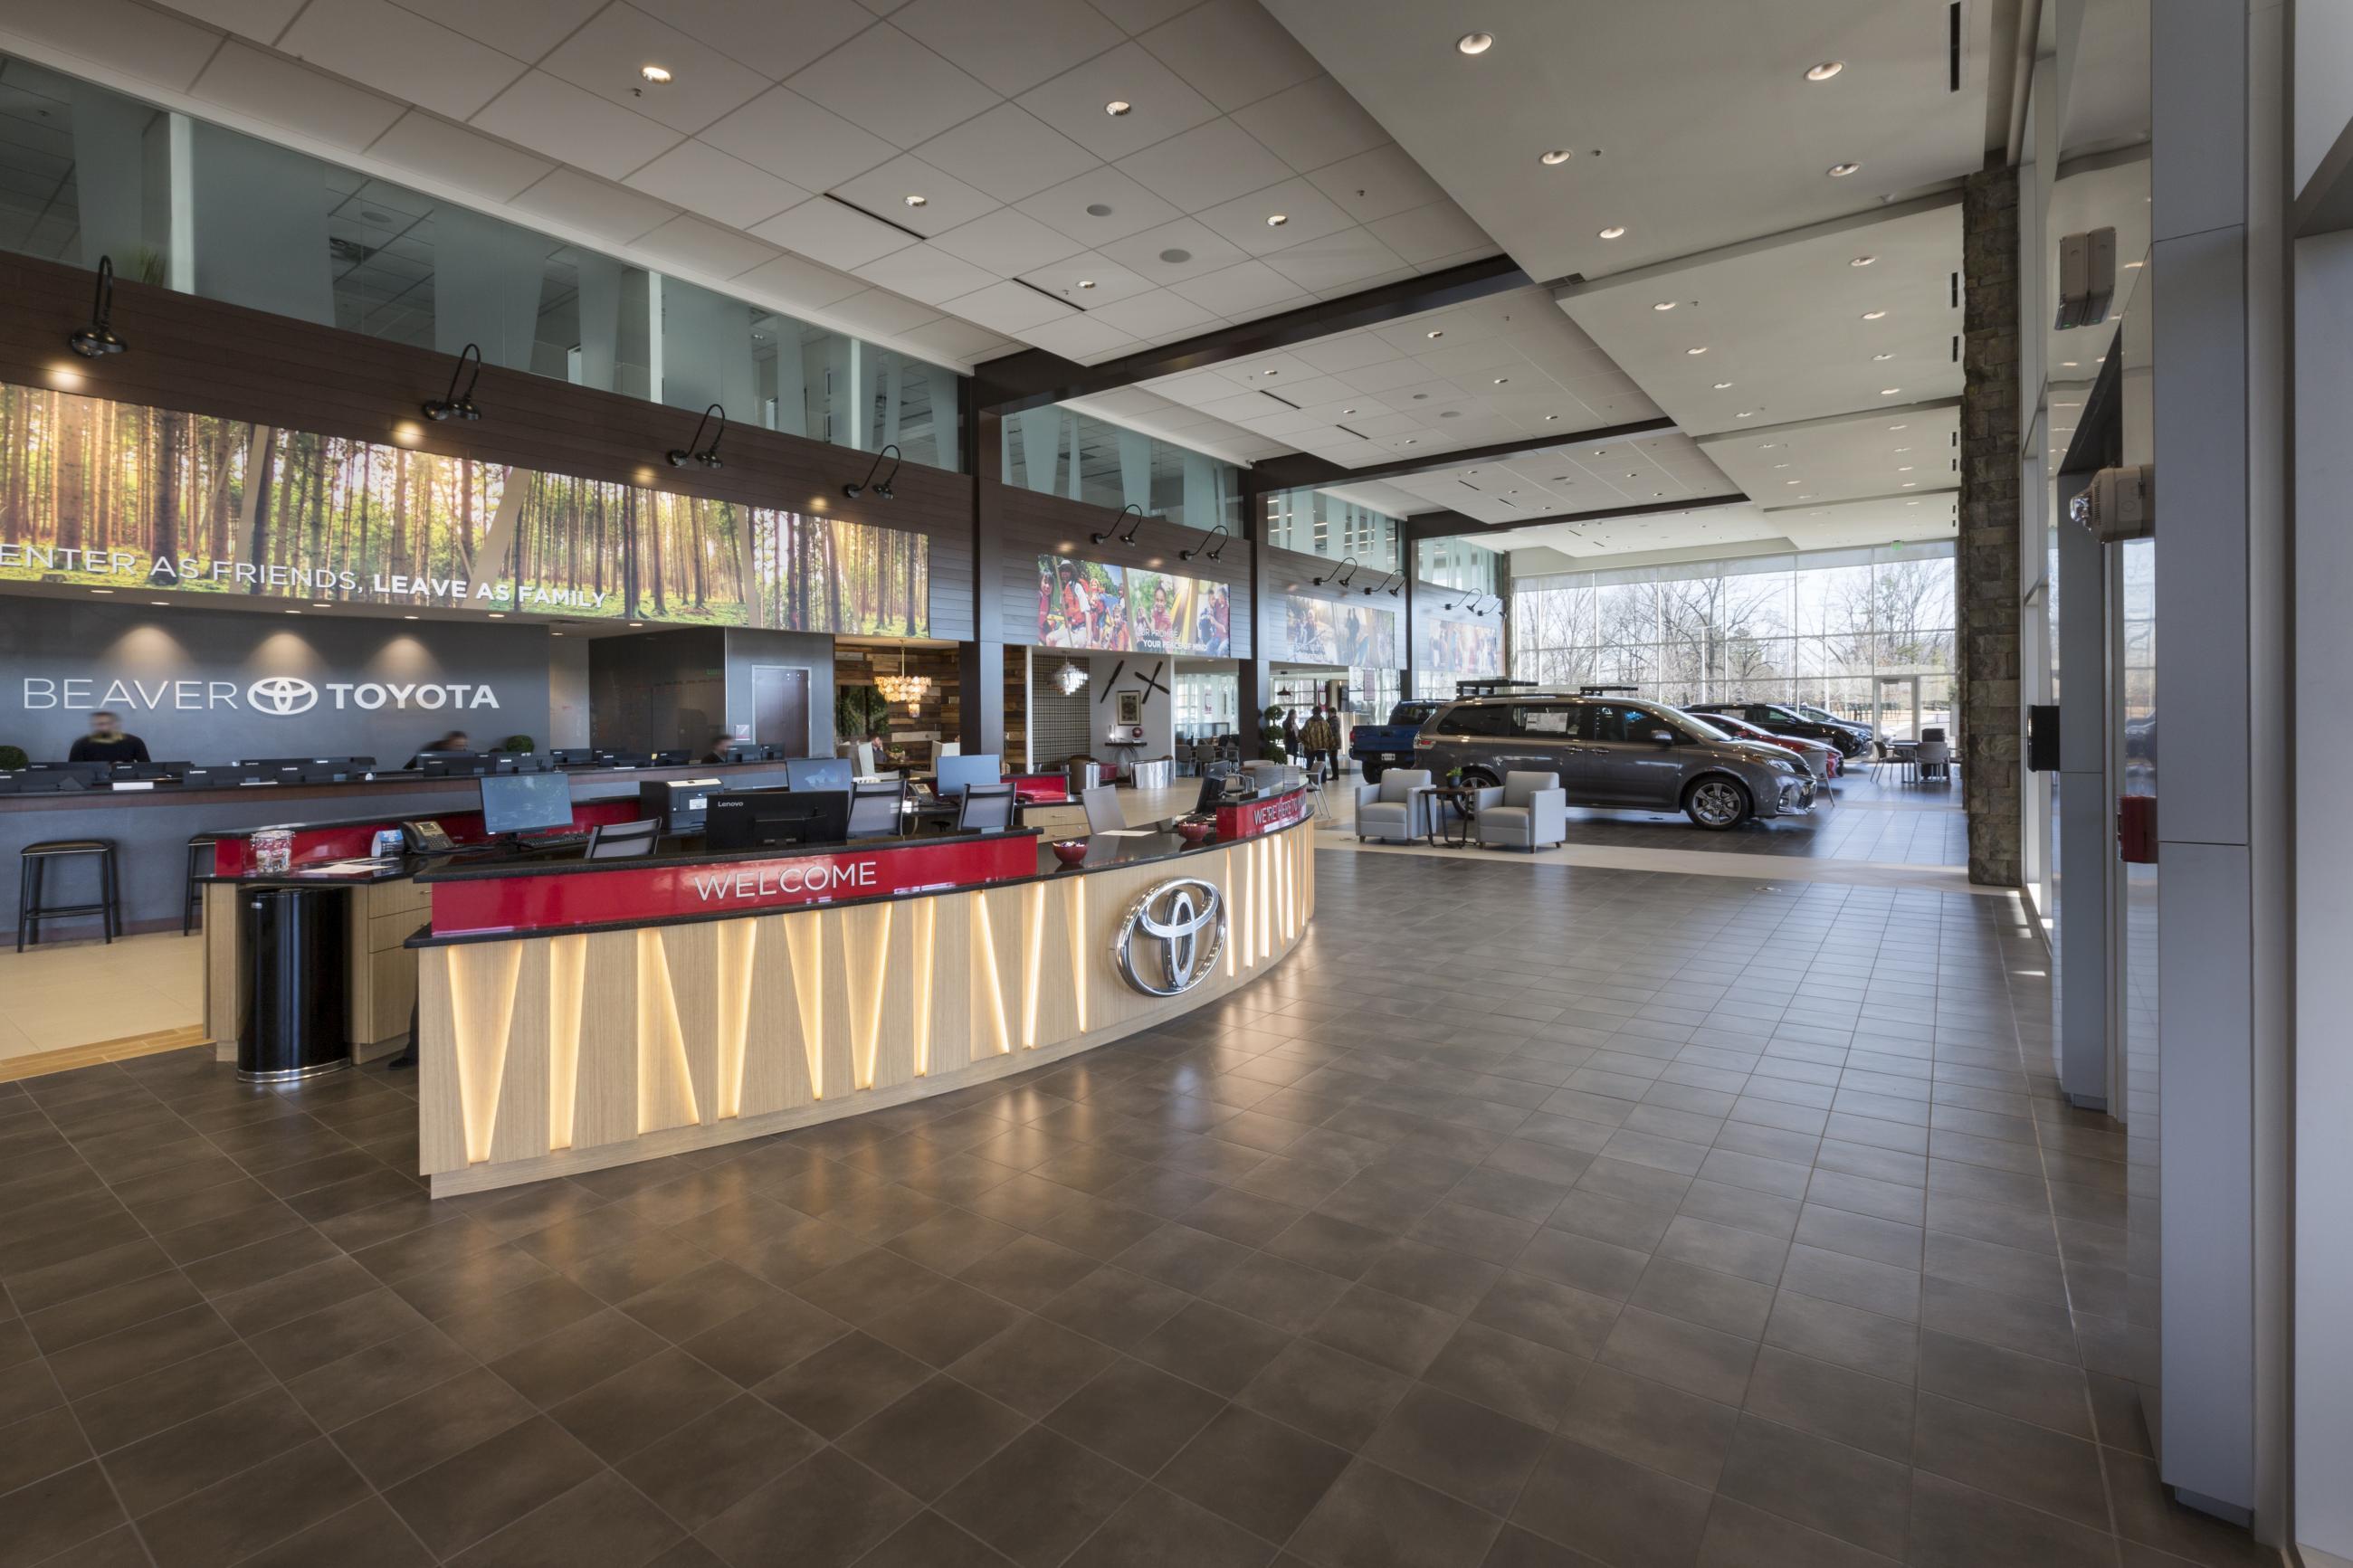 Honda Dealership Indianapolis >> Beaver Toyota | Custom Facilities